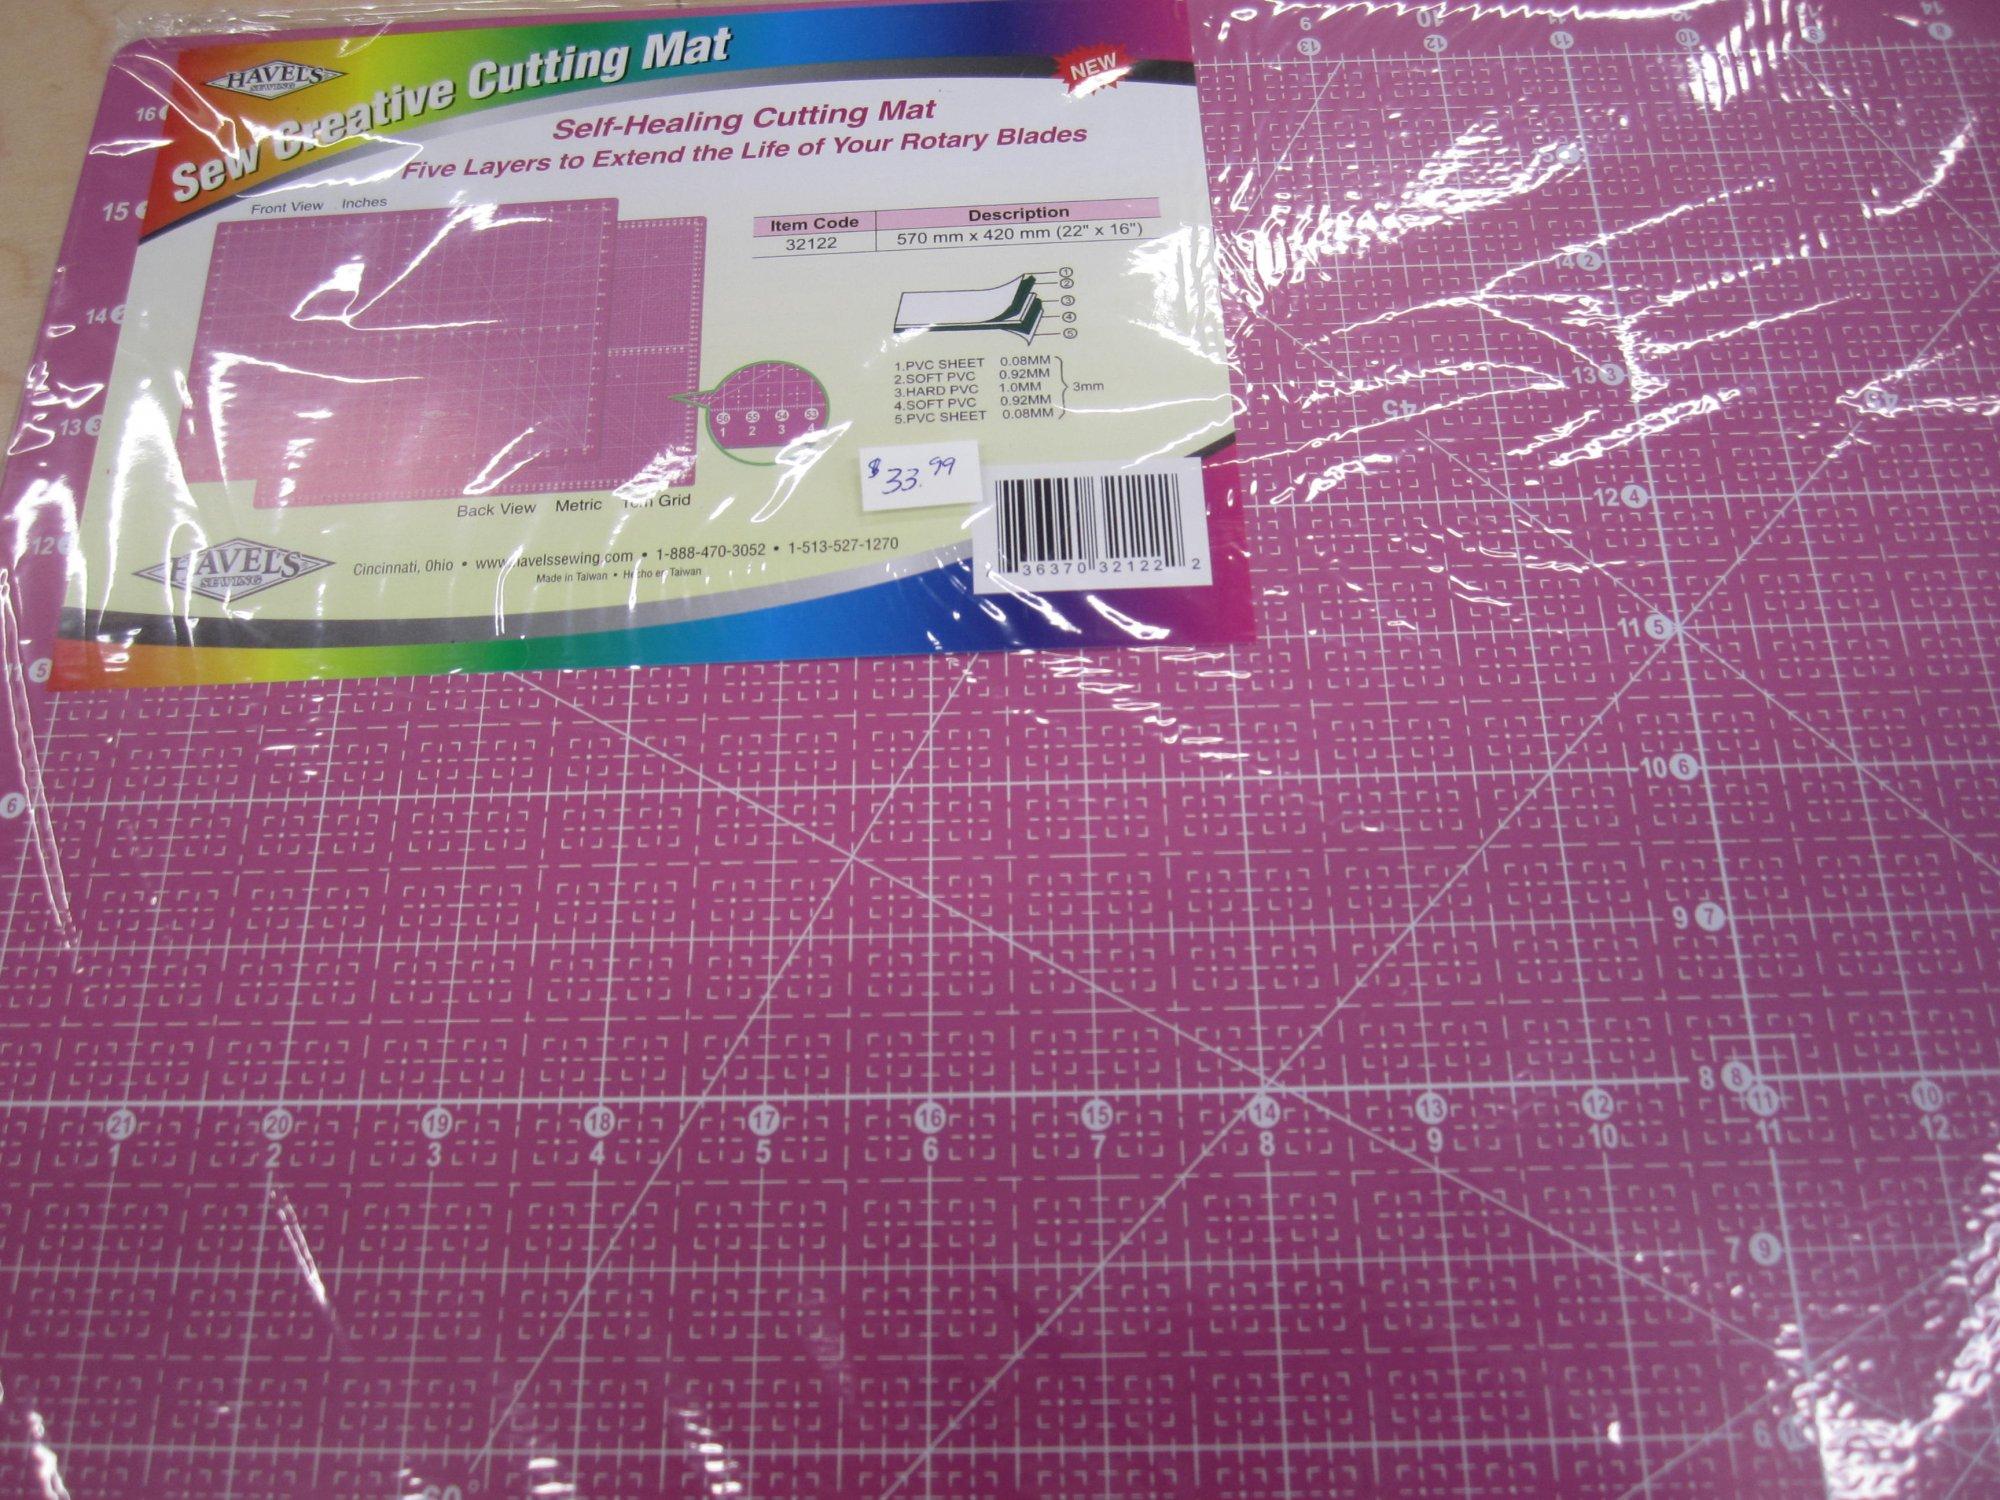 Sew Creative cutting matt